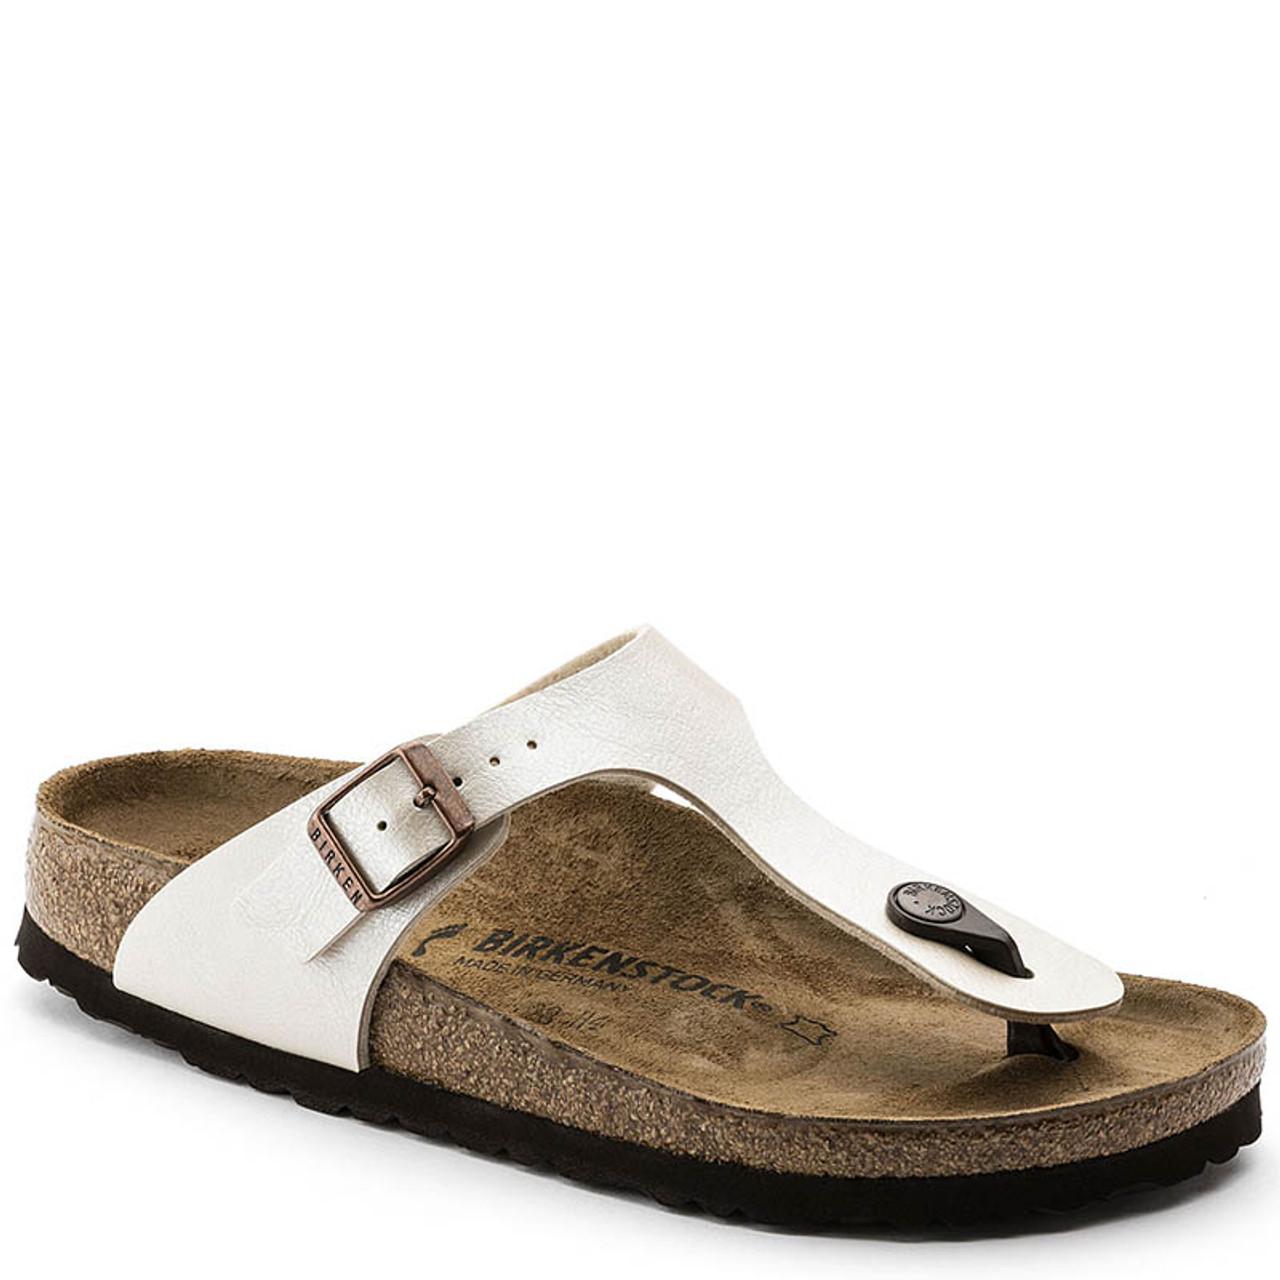 Birko Sandals Flor Pearl Birkenstock White Gizeh XuOZwkTPi